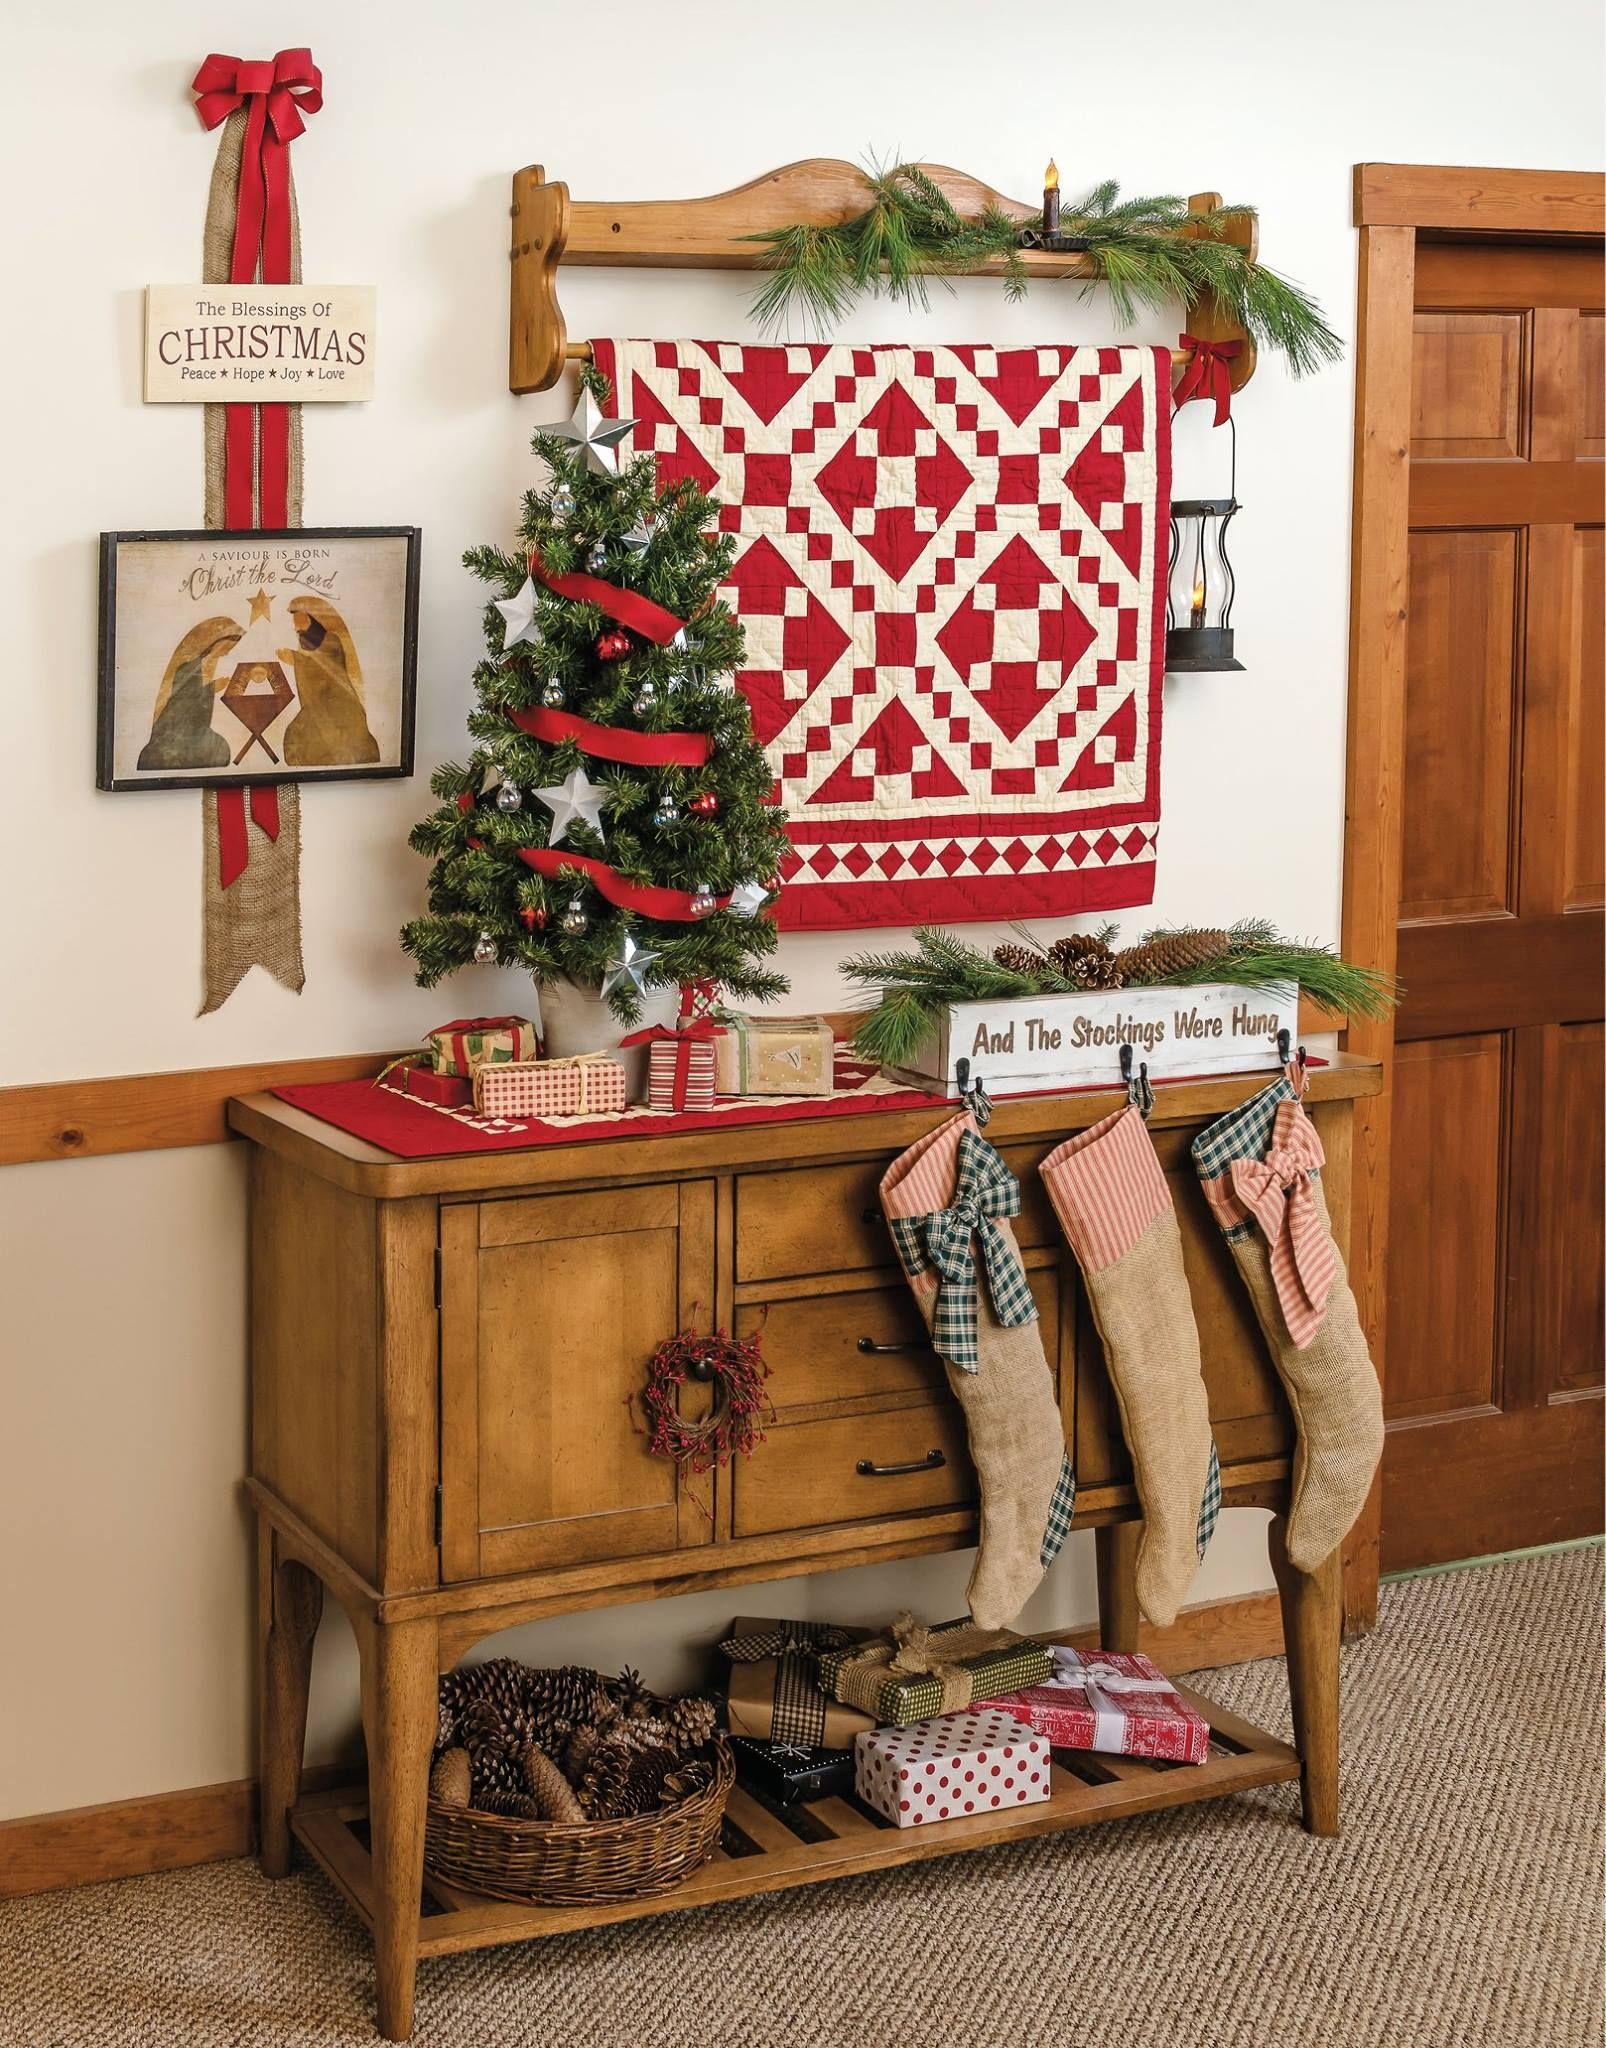 Country Sampler Magazine Holiday Decor Country Sampler